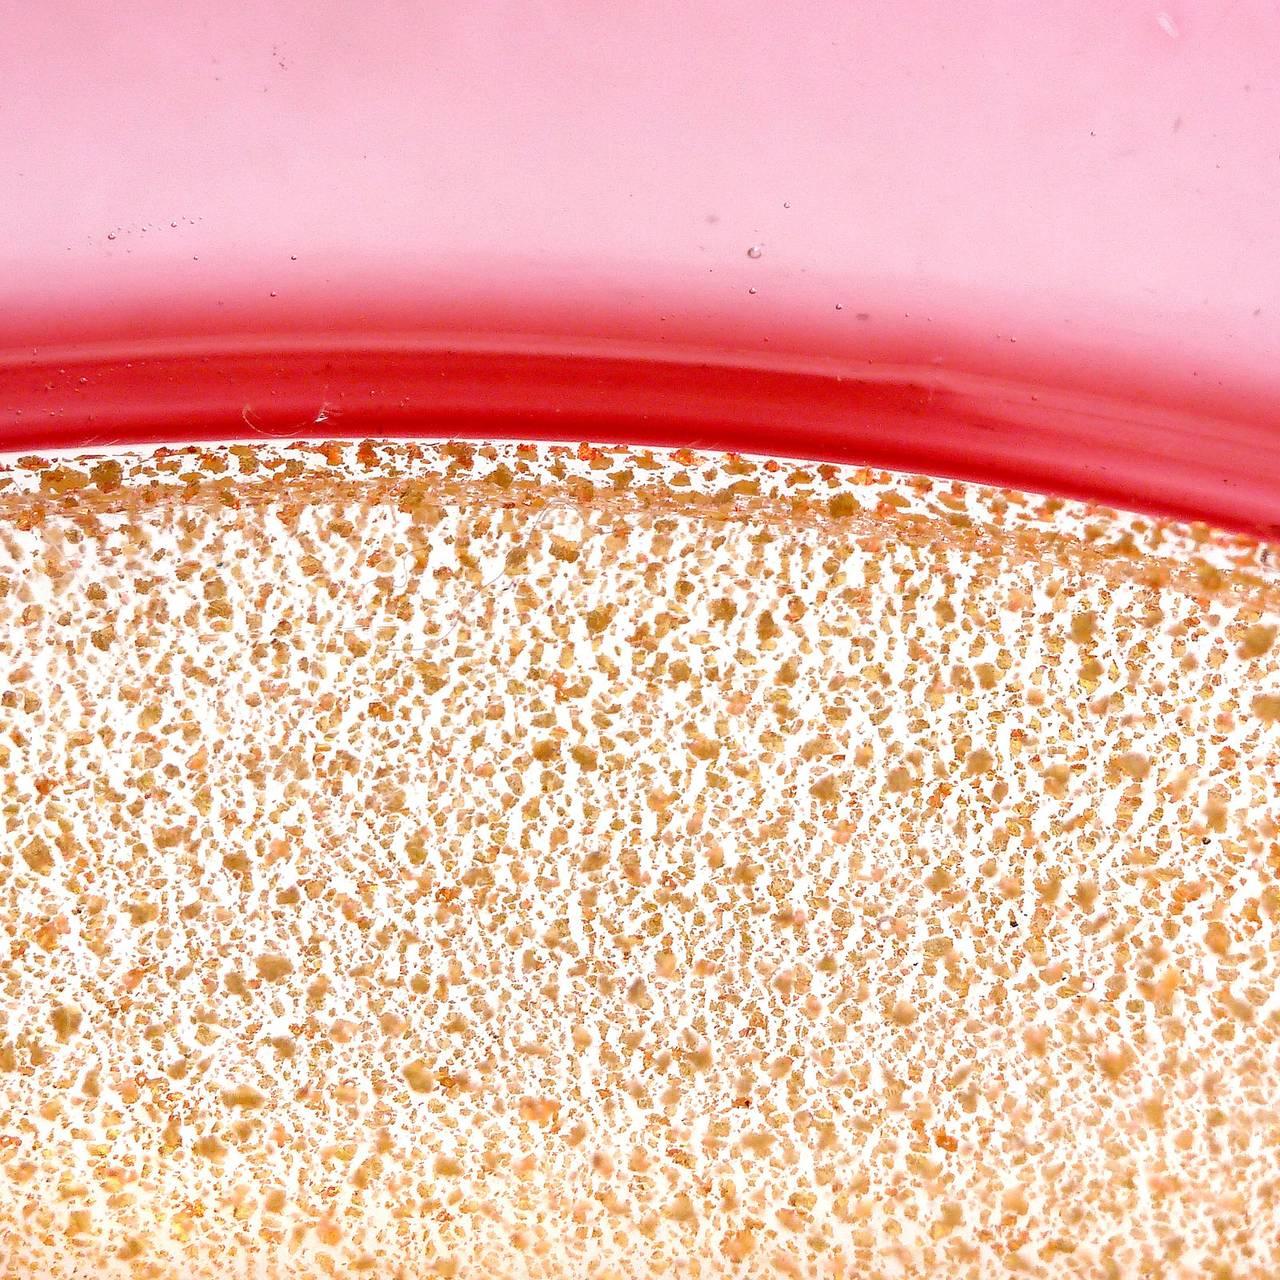 Mid-Century Modern Archimede Seguso Murano Gold Flecks Pink Incalmo Rim Italian Art Glass Bowl For Sale